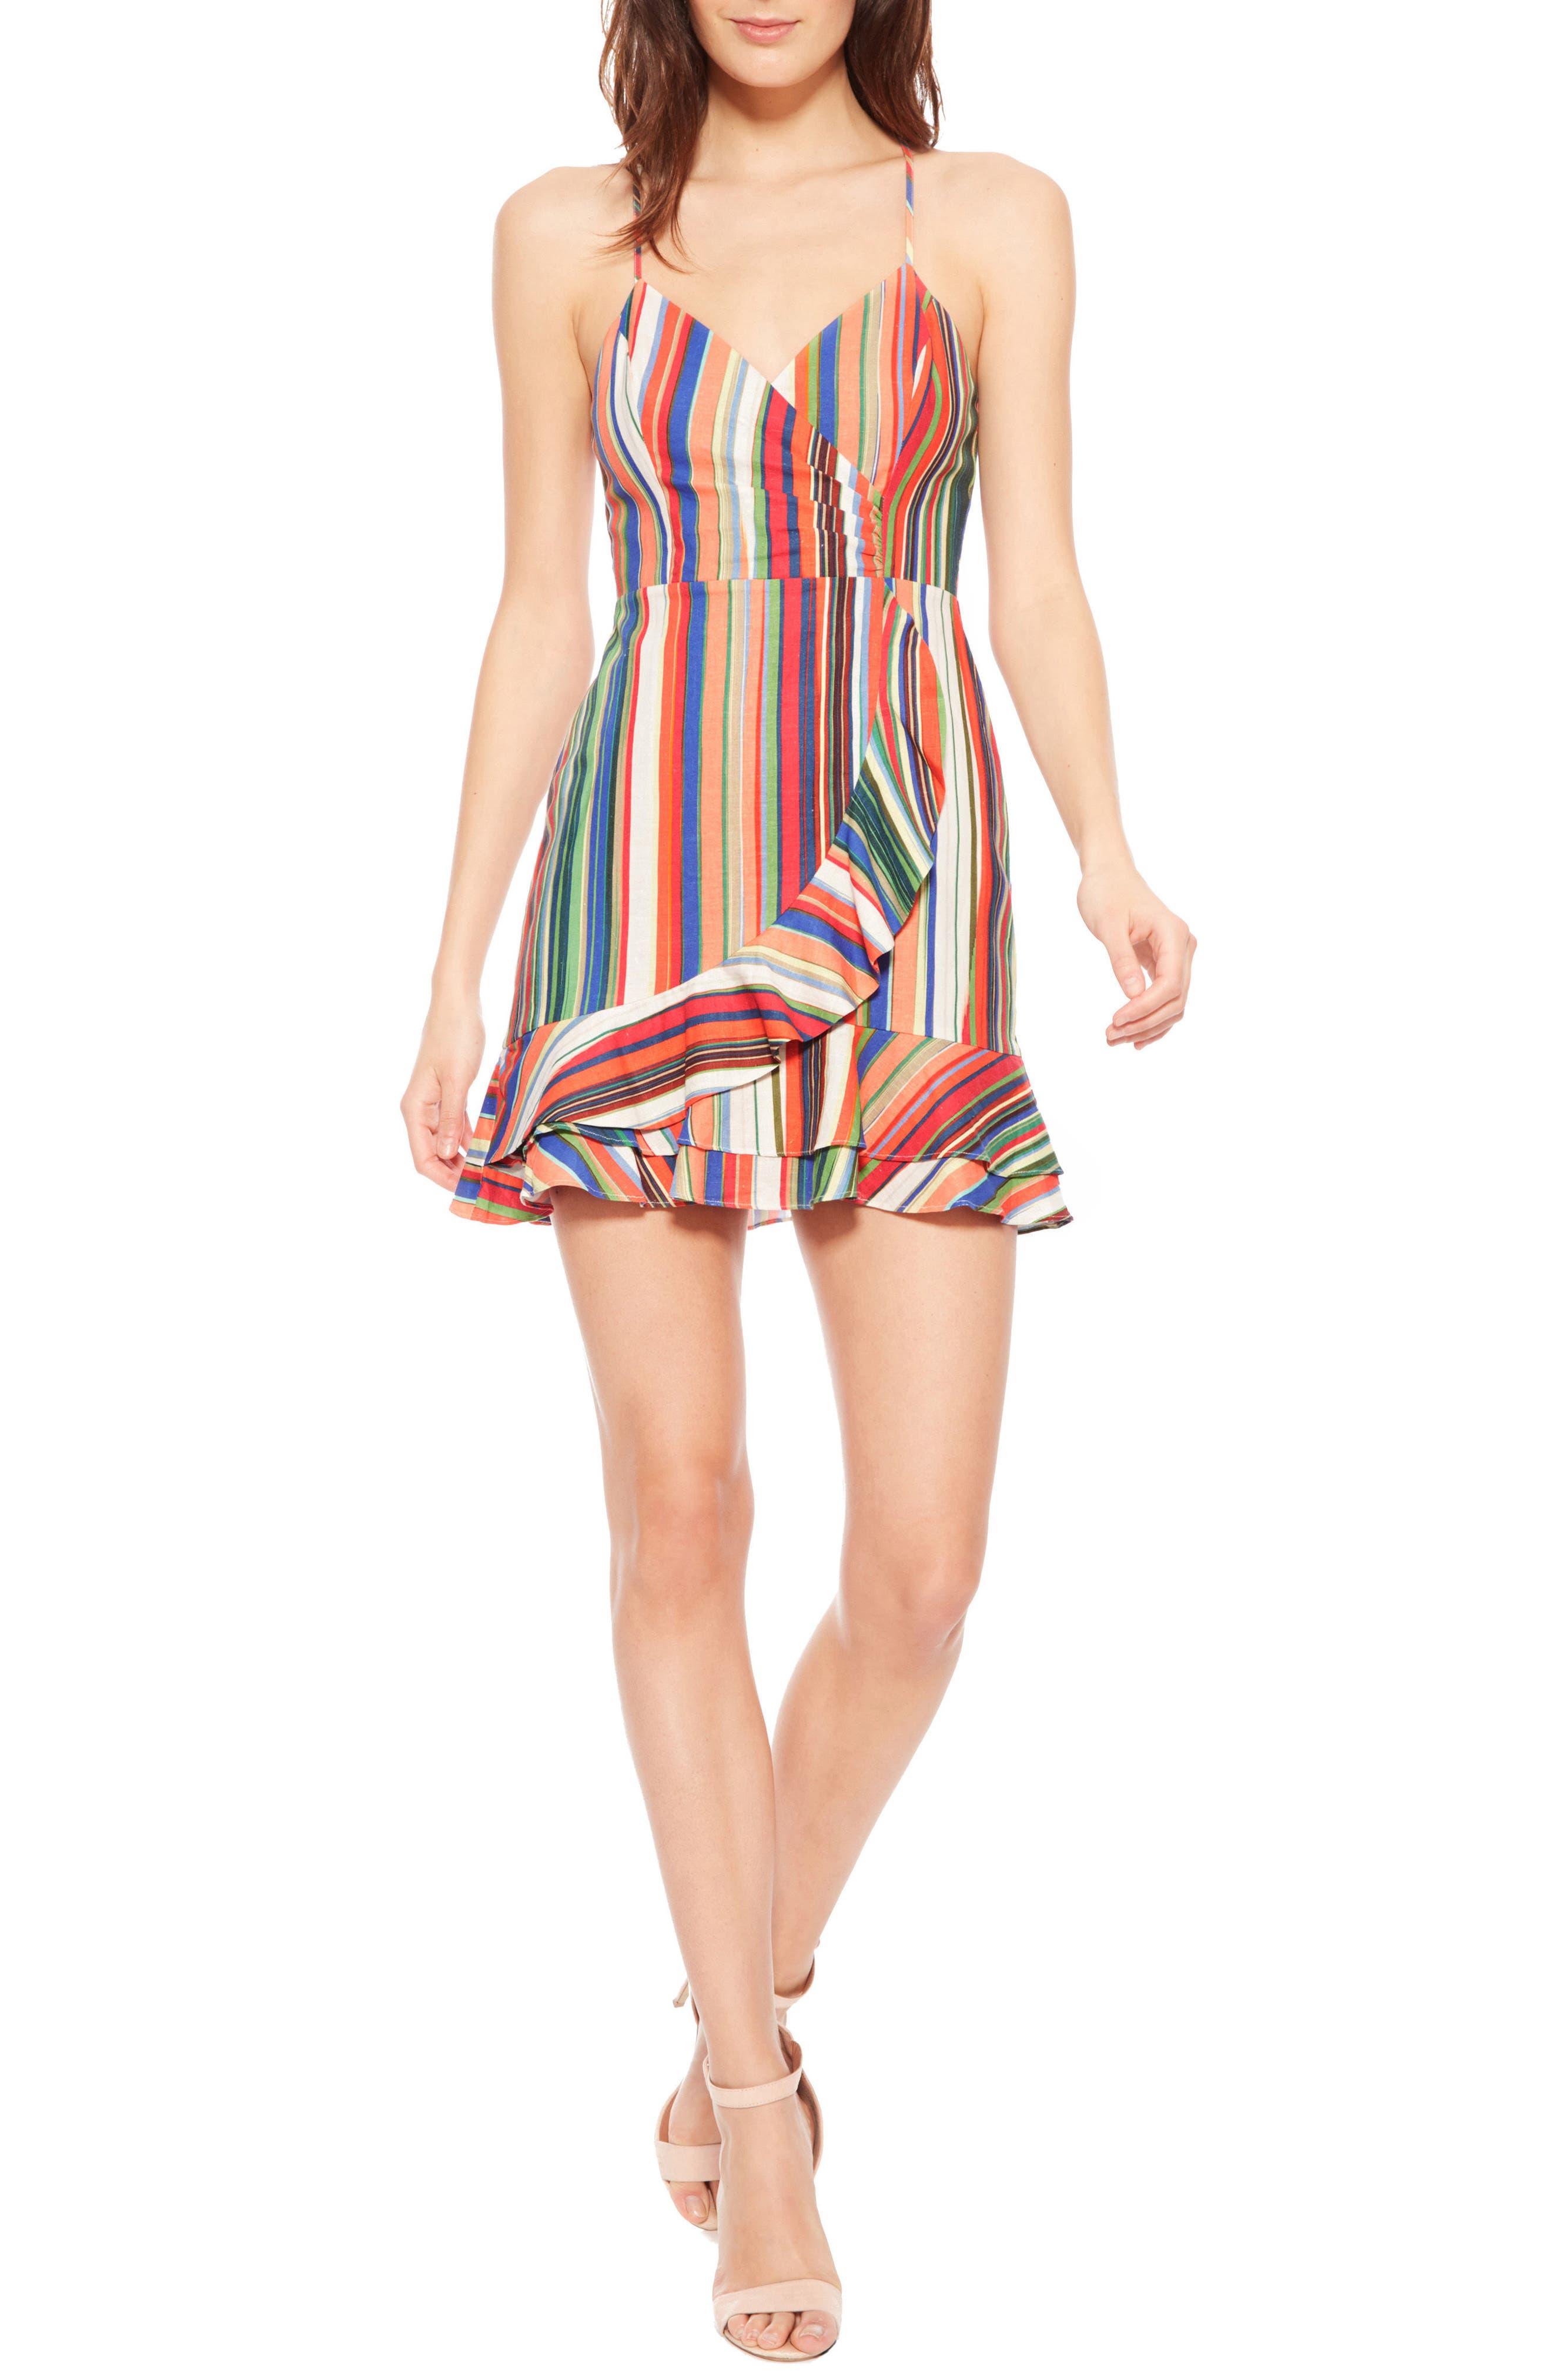 Jay Stripe Dress,                             Main thumbnail 1, color,                             606